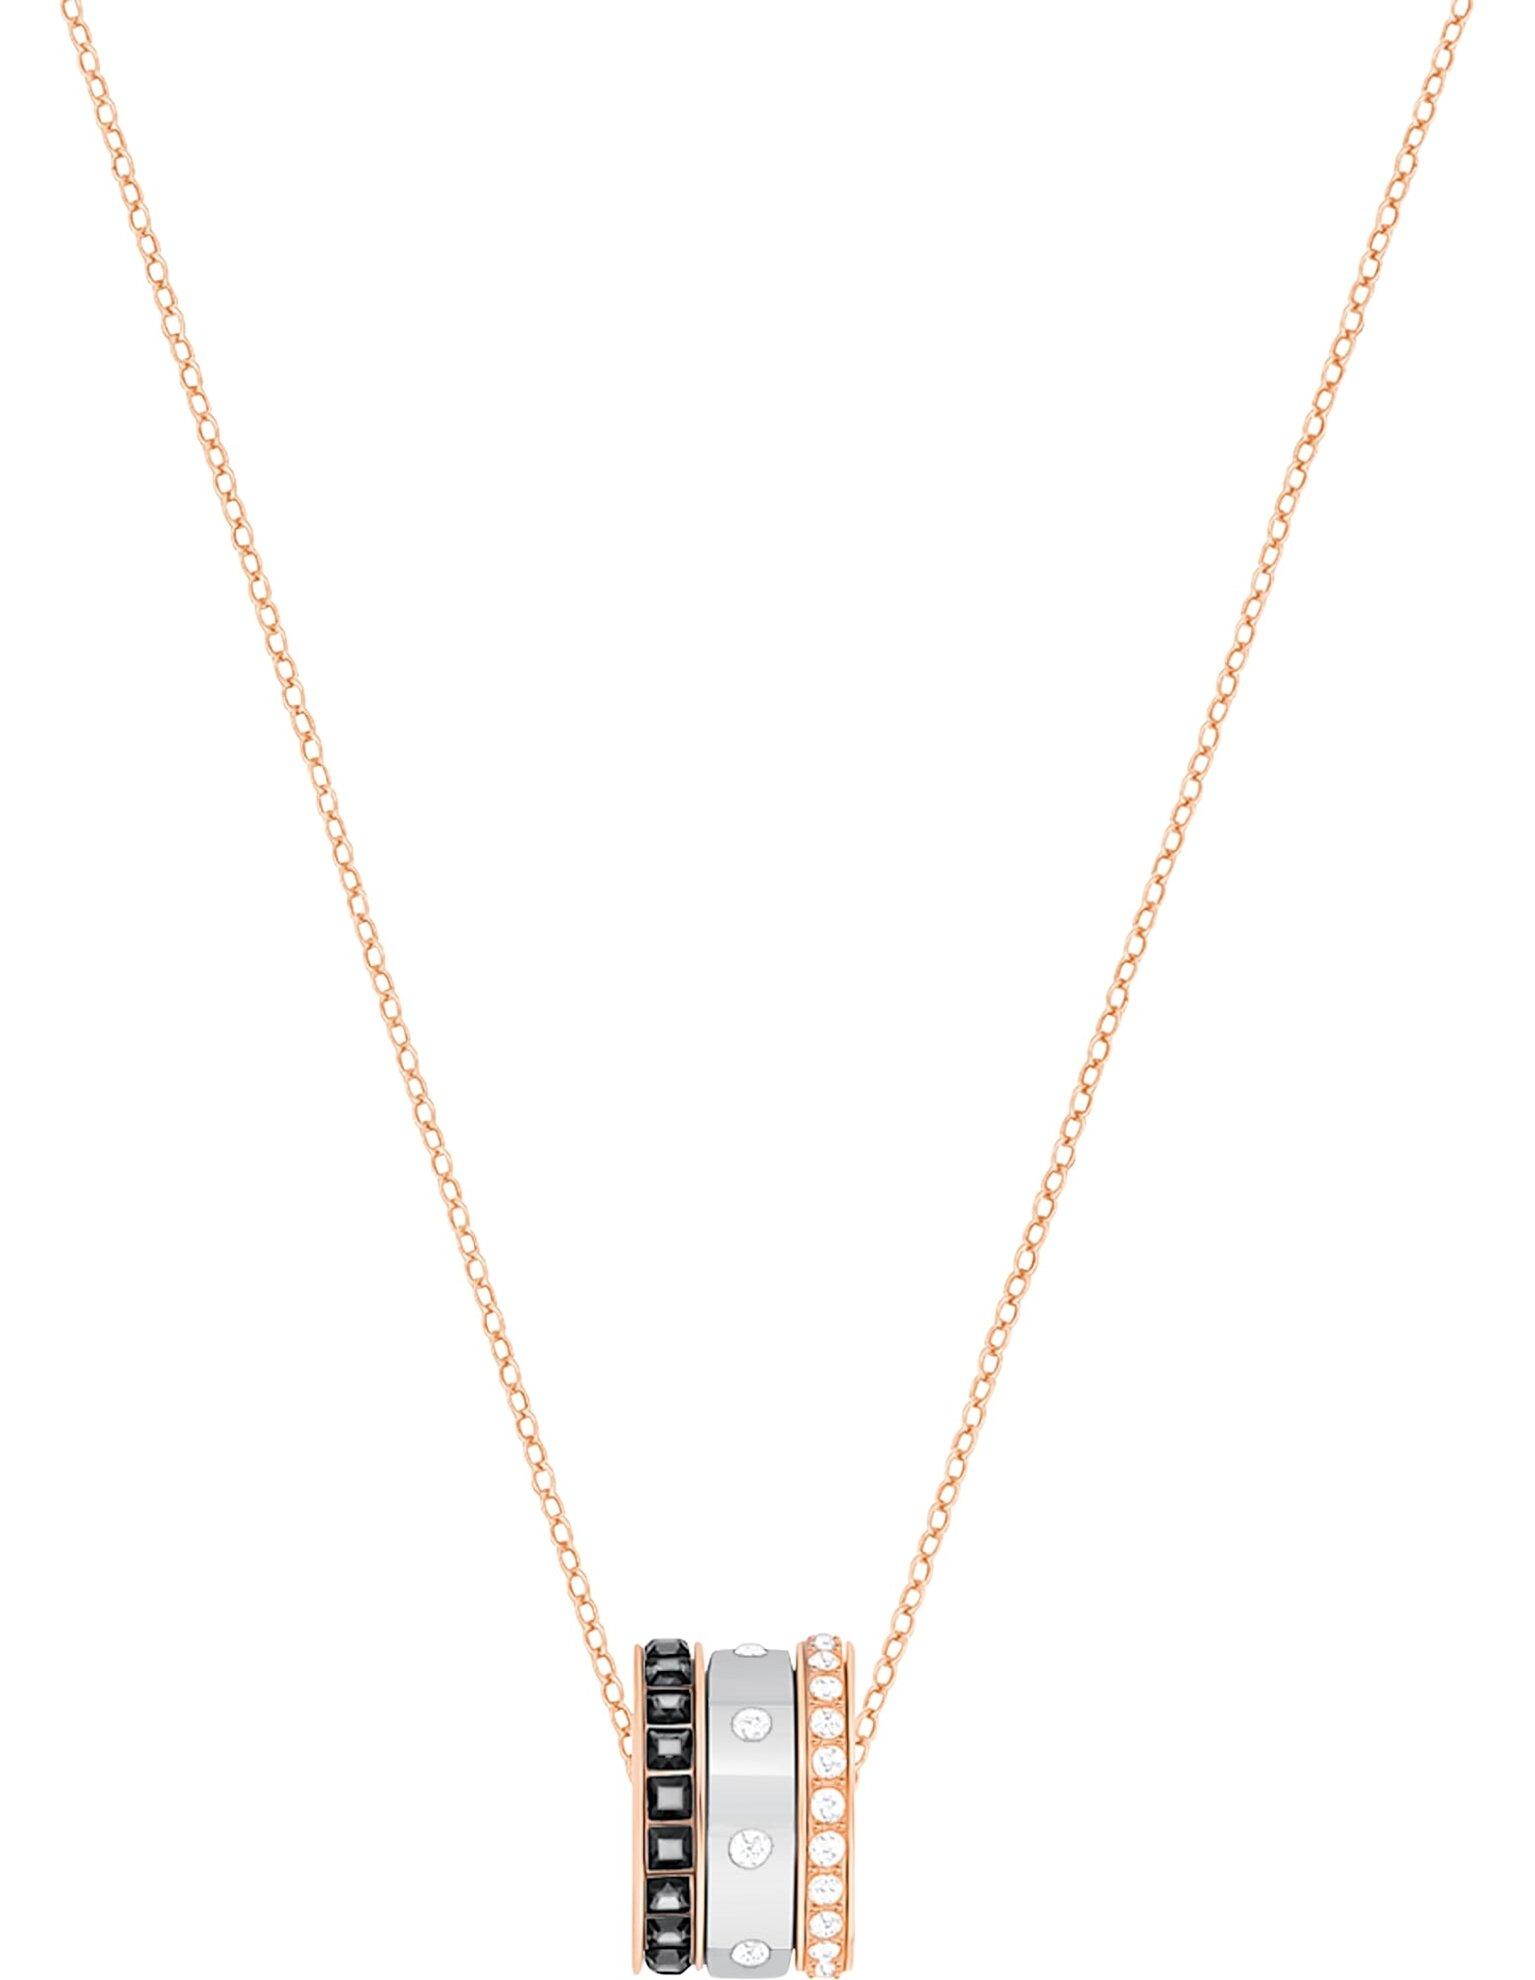 Picture of Hint kolye, Cok Renkli, Karışık metal